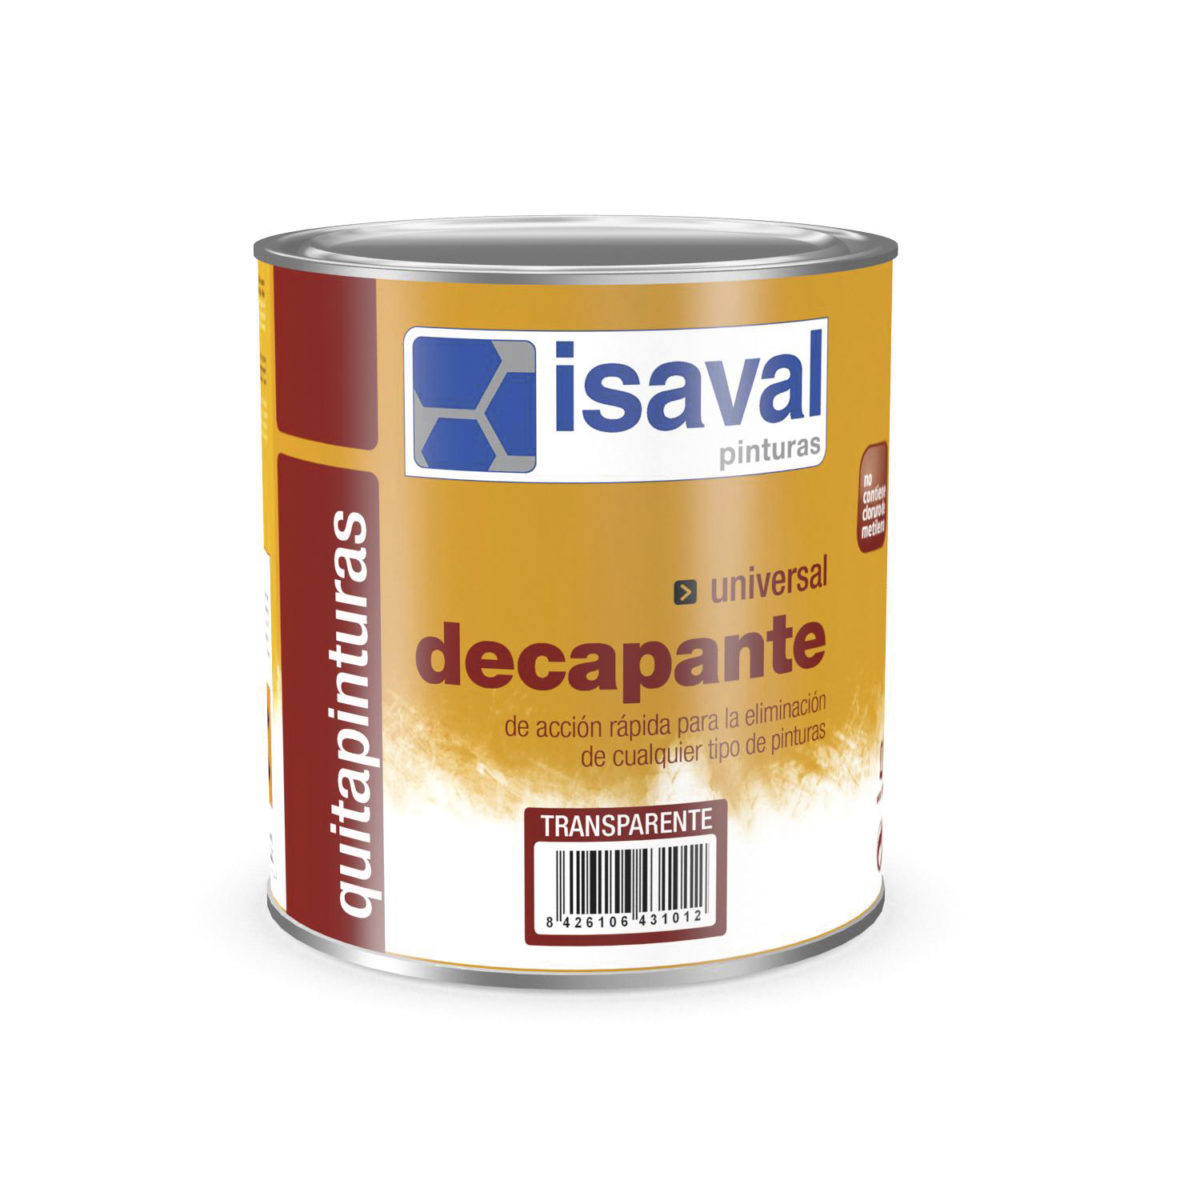 Quitapinturas universal. Gel decapante pintura de Isaval